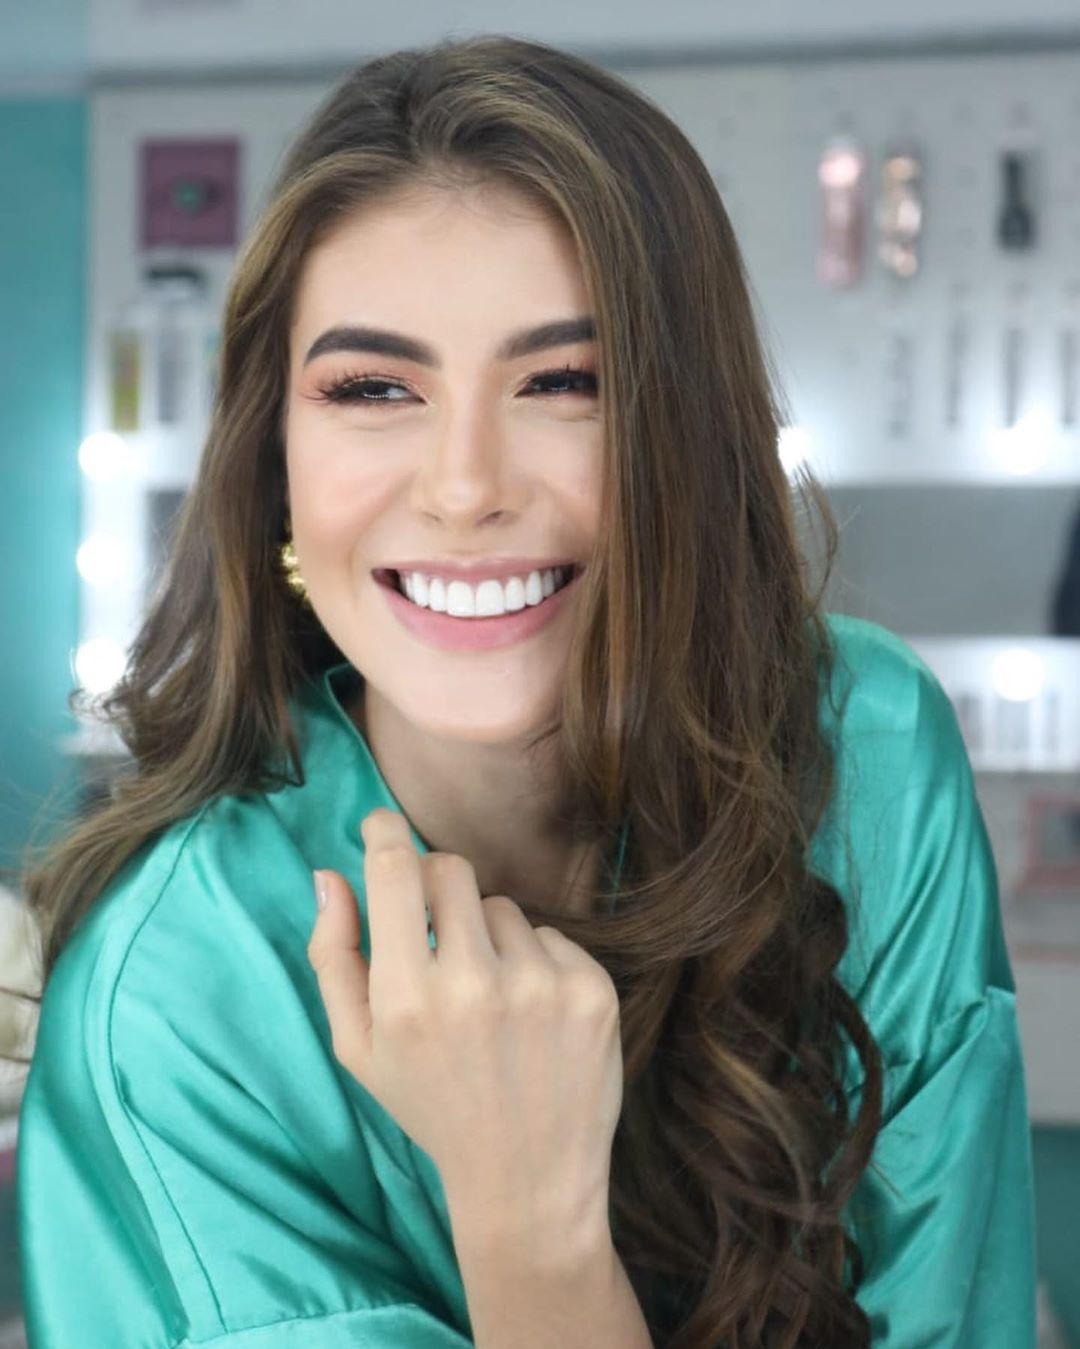 alejandra salazar, miss international colombia 2021. 81929310